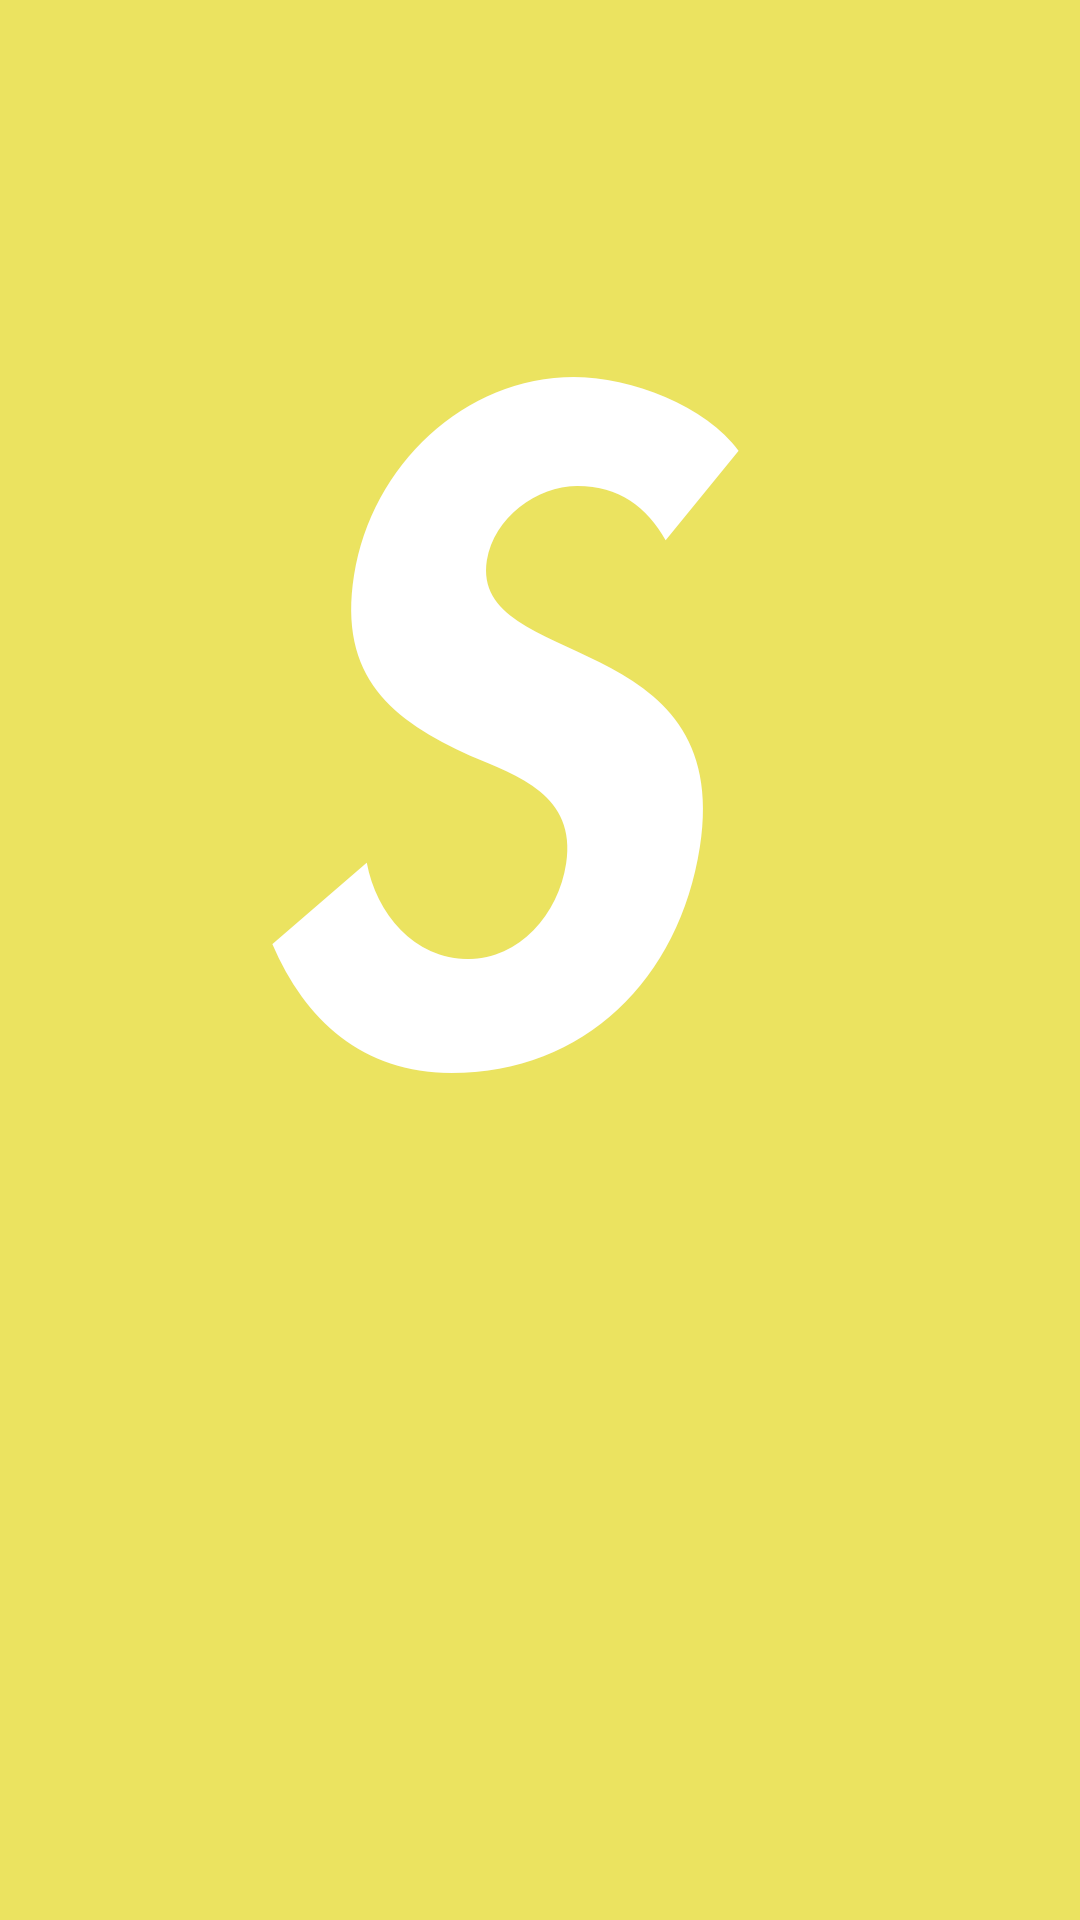 Supreme iphone x wallpapers top free supreme iphone x - Supreme wallpaper iphone 6 ...